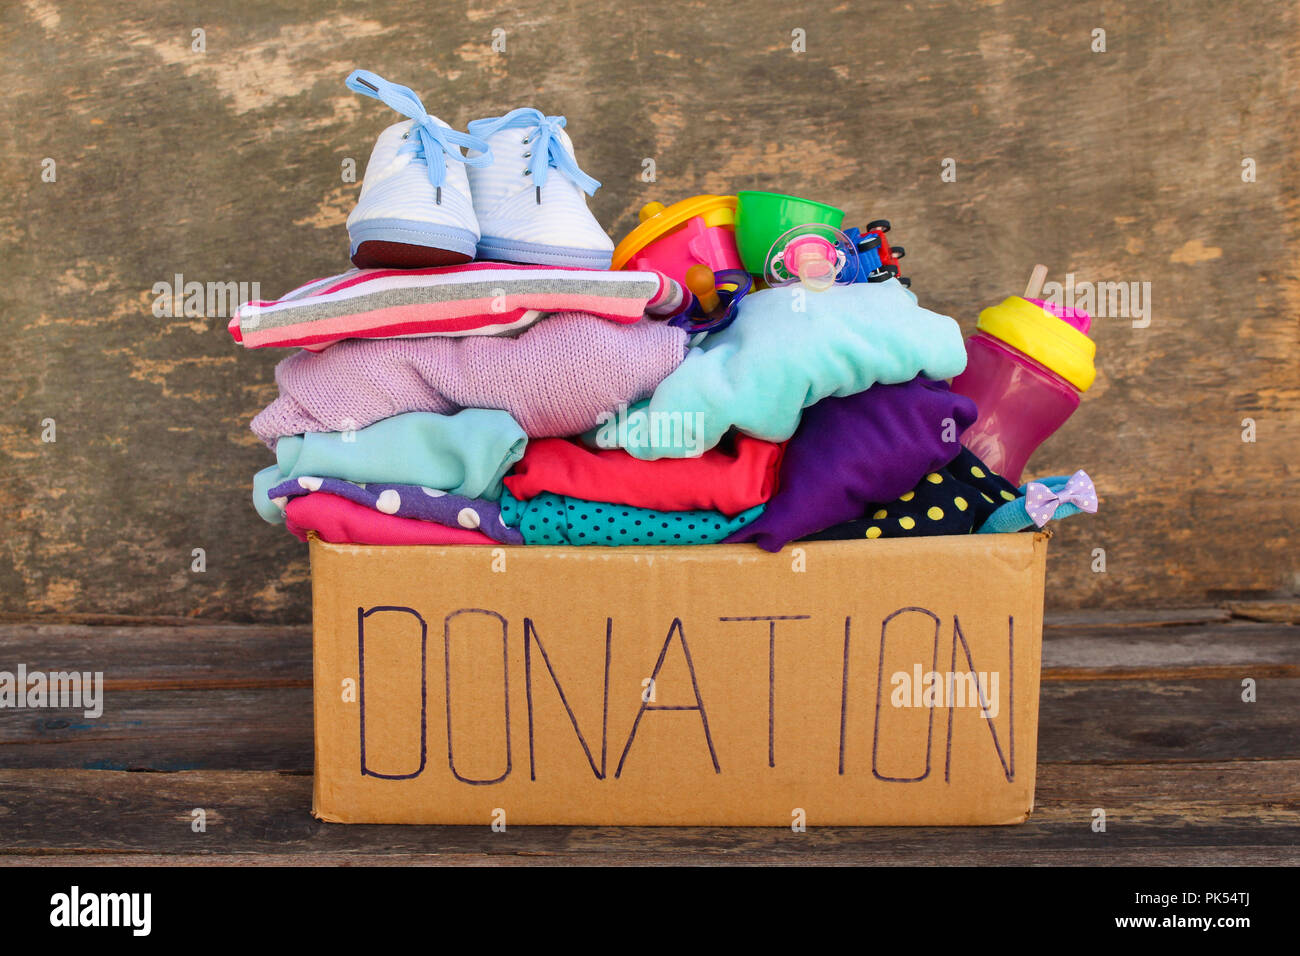 Clothing Donation Stock Photos Amp Clothing Donation Stock